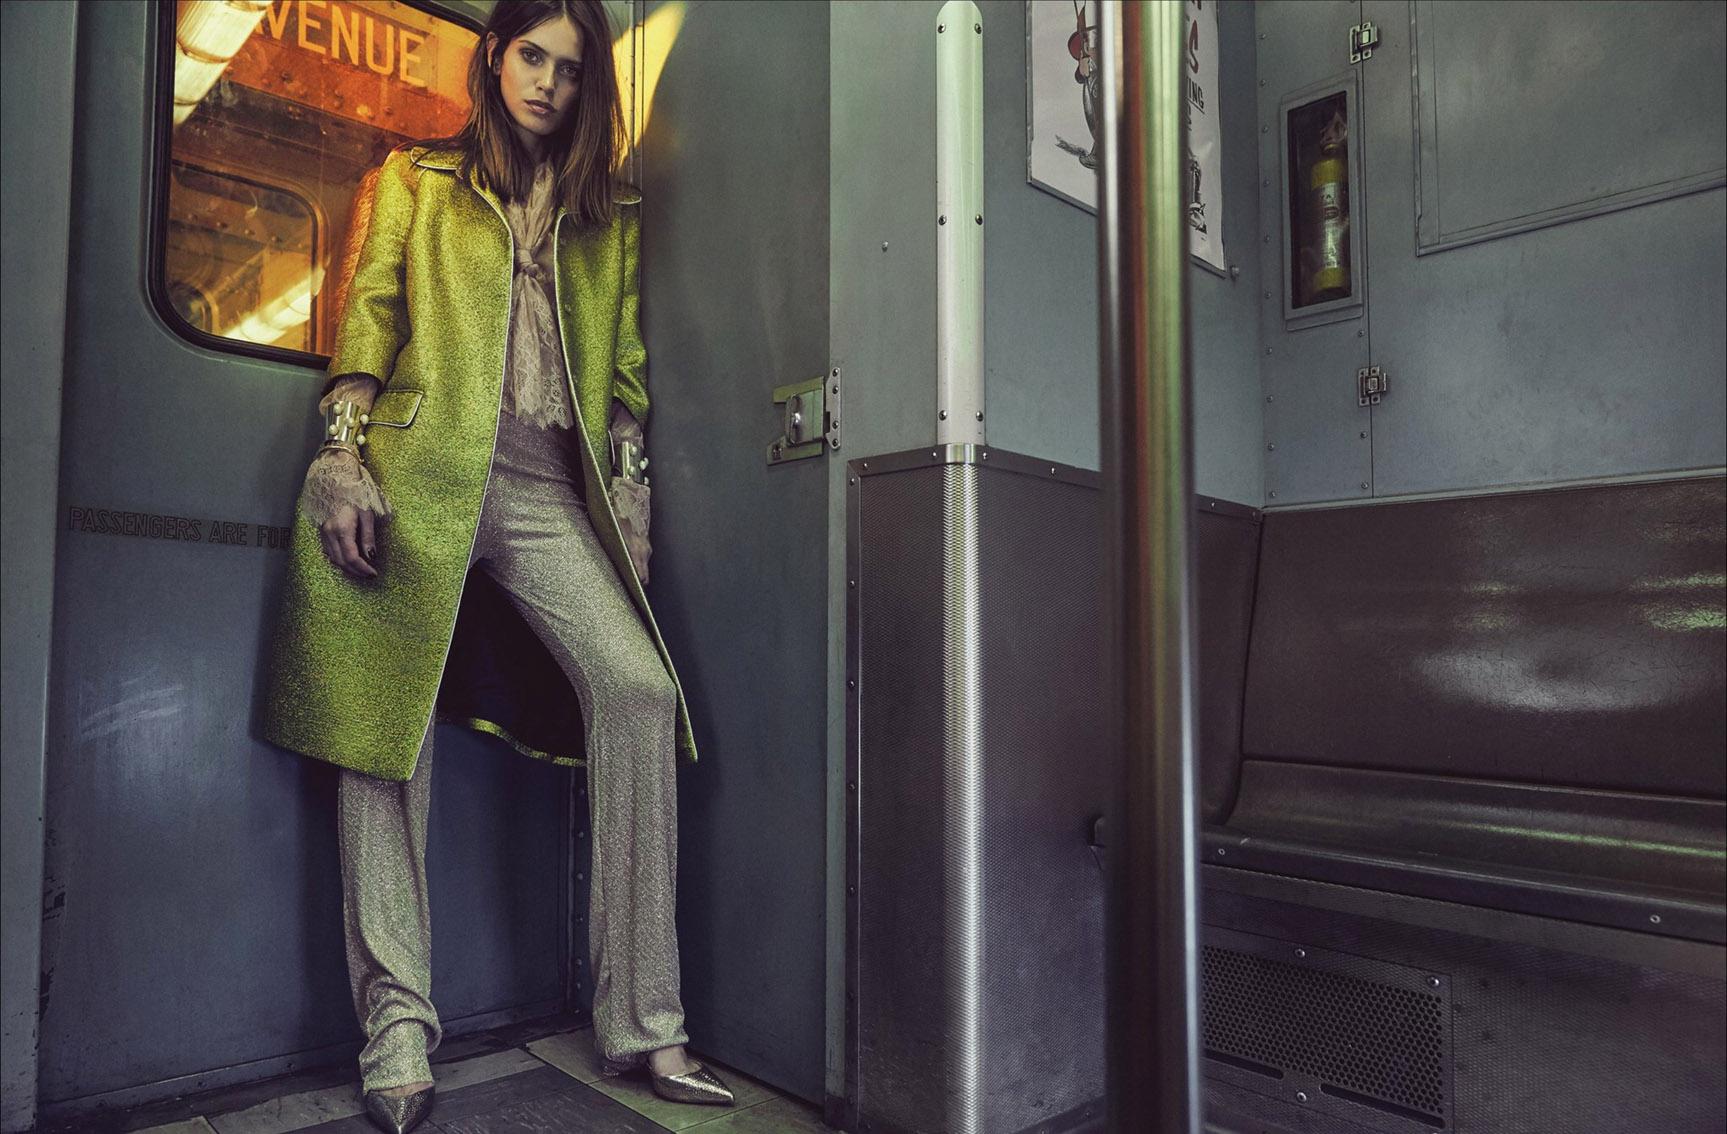 В нью-йоркском метро с Амандой Уэллш / Amanda Wellsh by An Le - Vogue Portugal january 2017